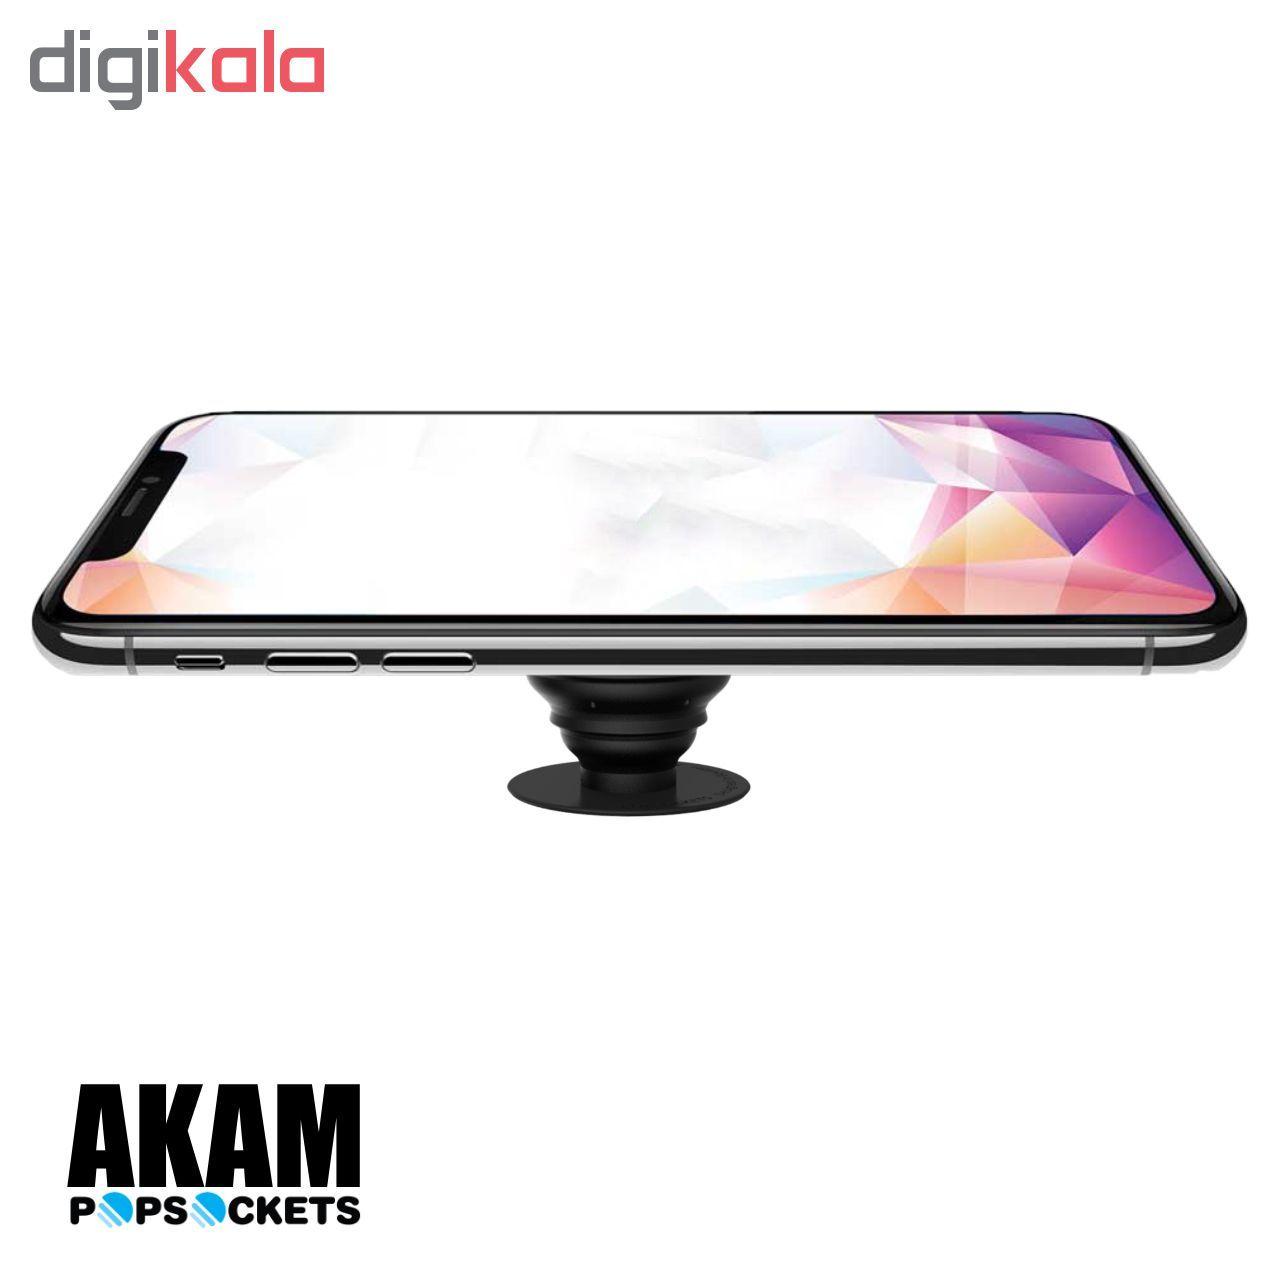 پایه نگهدارنده گوشی موبایل پاپ سوکت آکام مدل APS0107 main 1 10